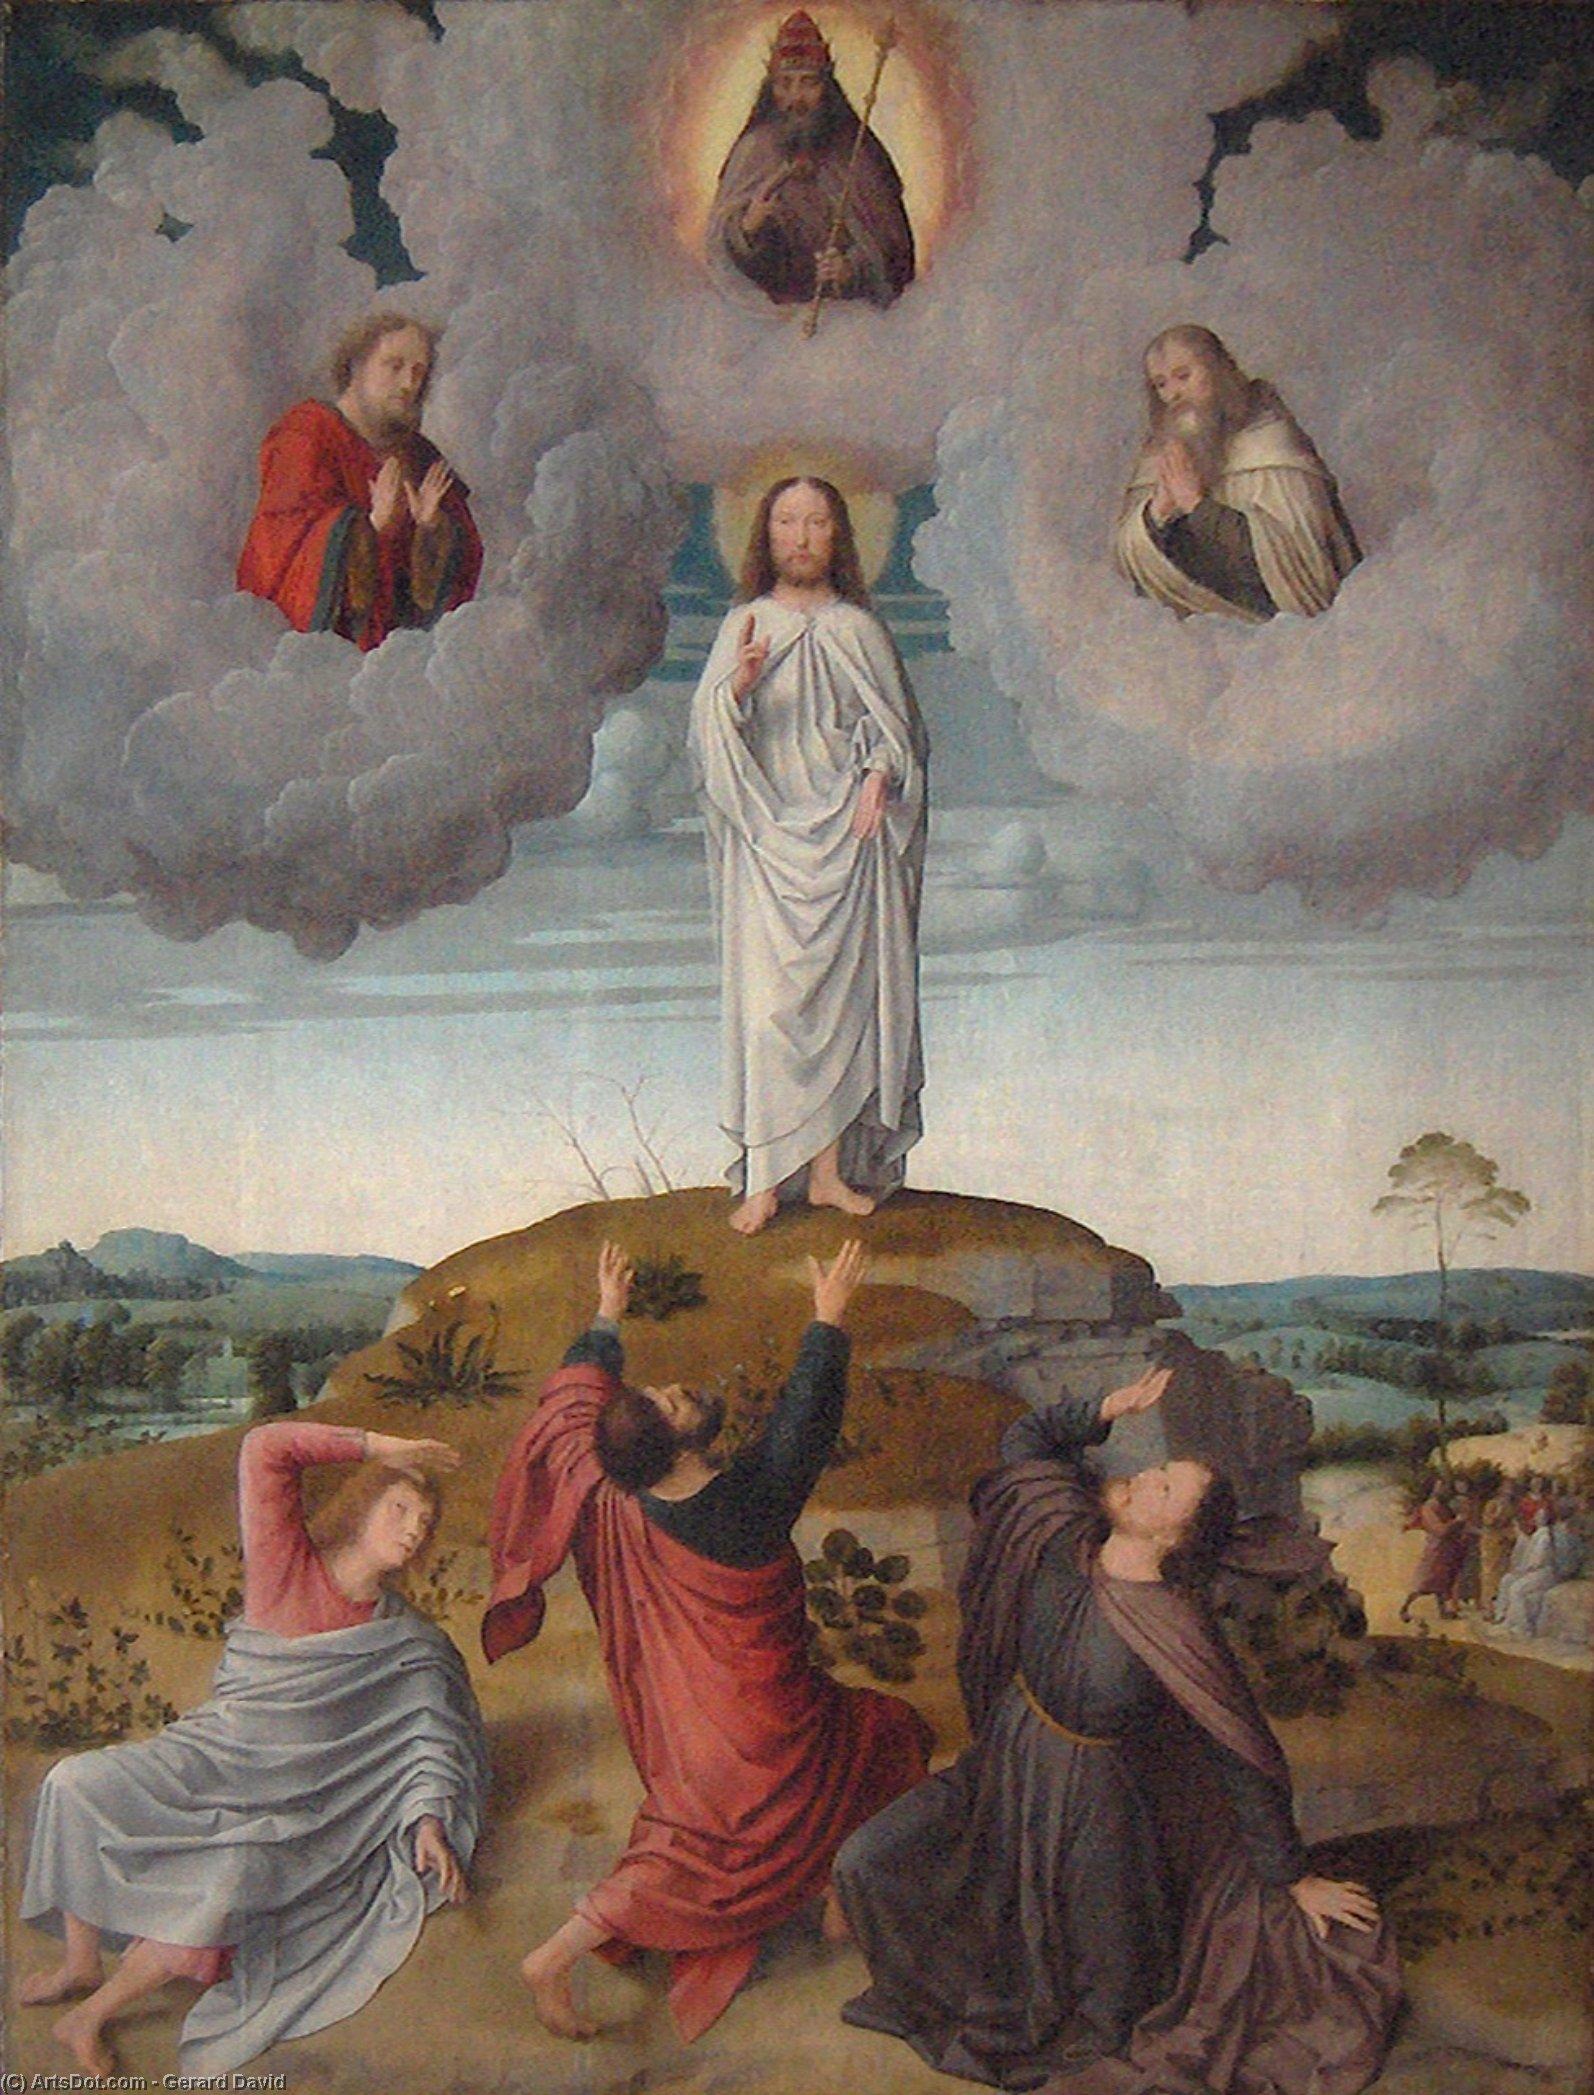 transfiguration of christ